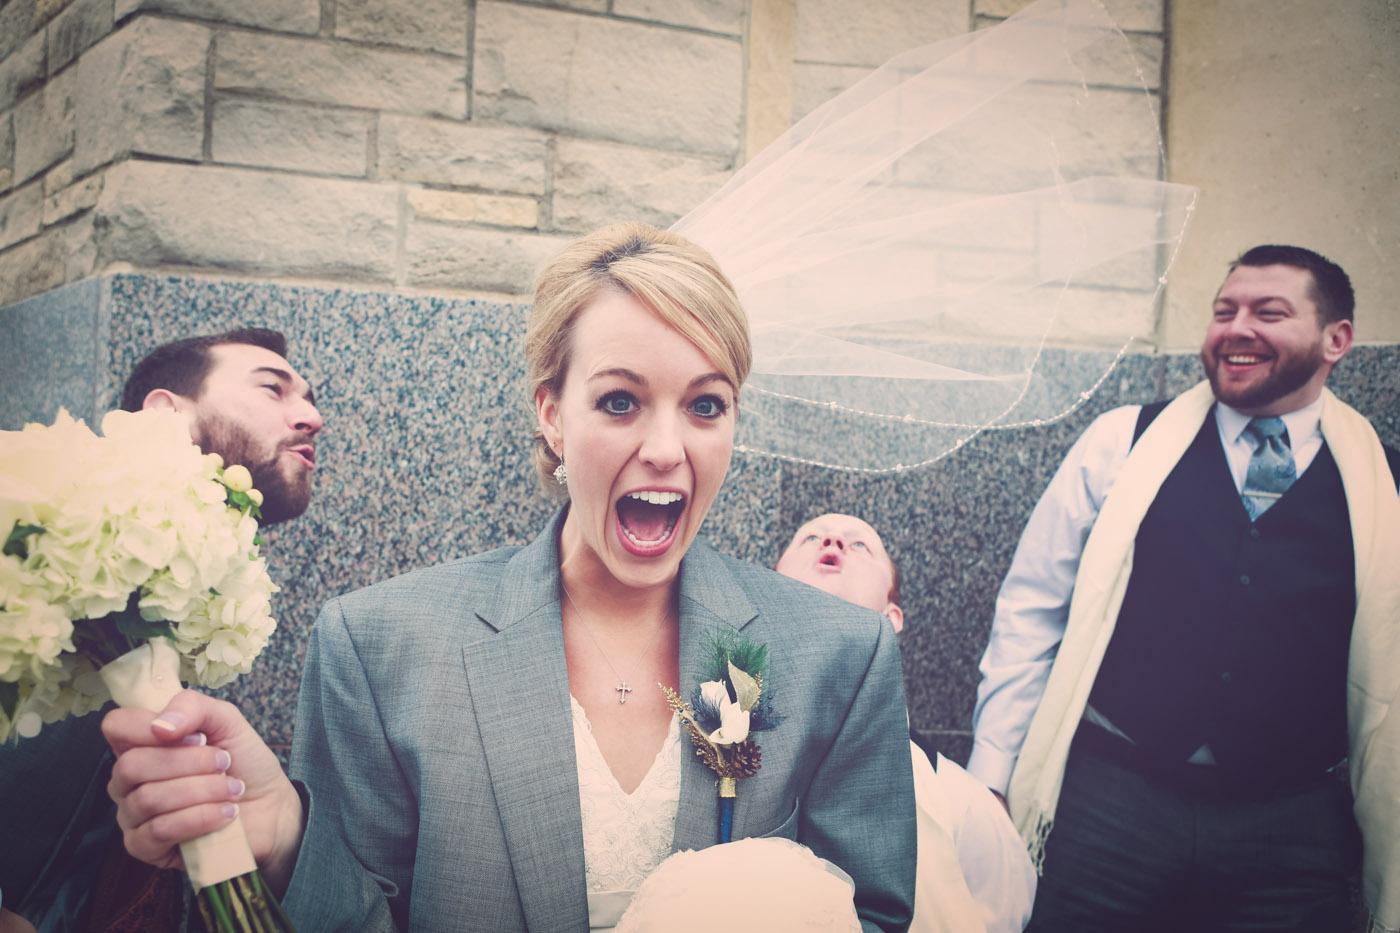 The wind blows a wedding veil on a bride.